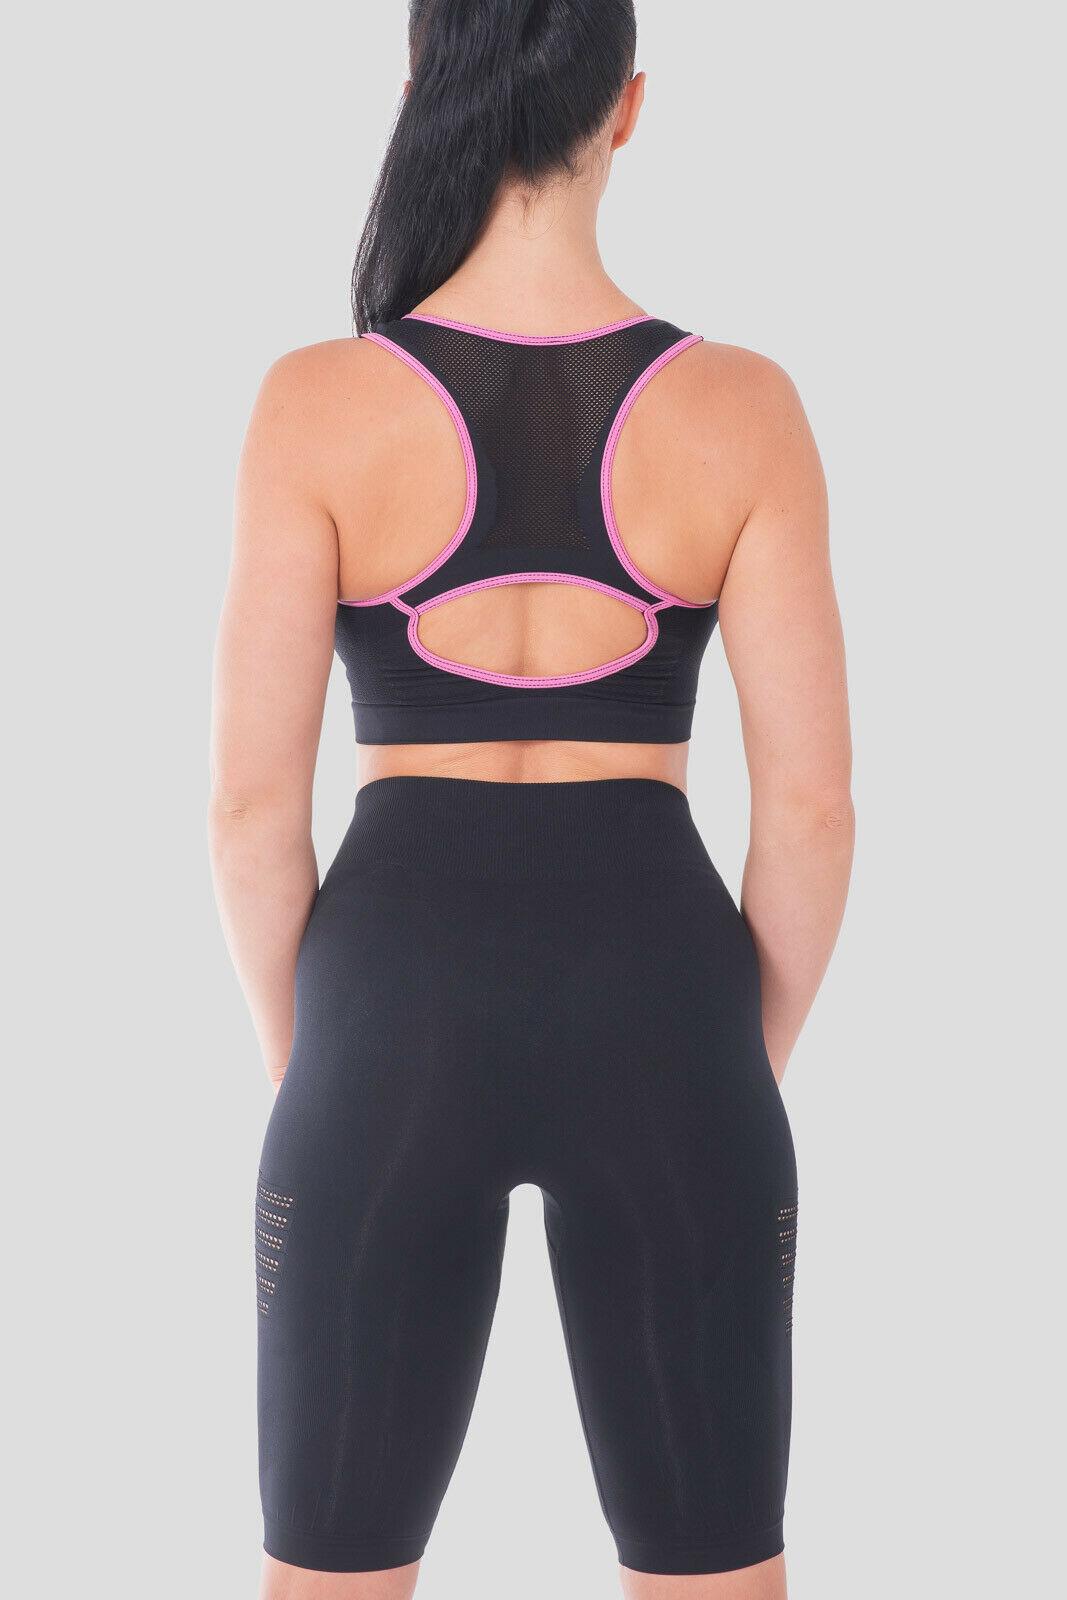 Bellissima-Women-039-s-Sport-Bra-Running-Yoga-Workout-Fitness-Racerback-Seamless thumbnail 28